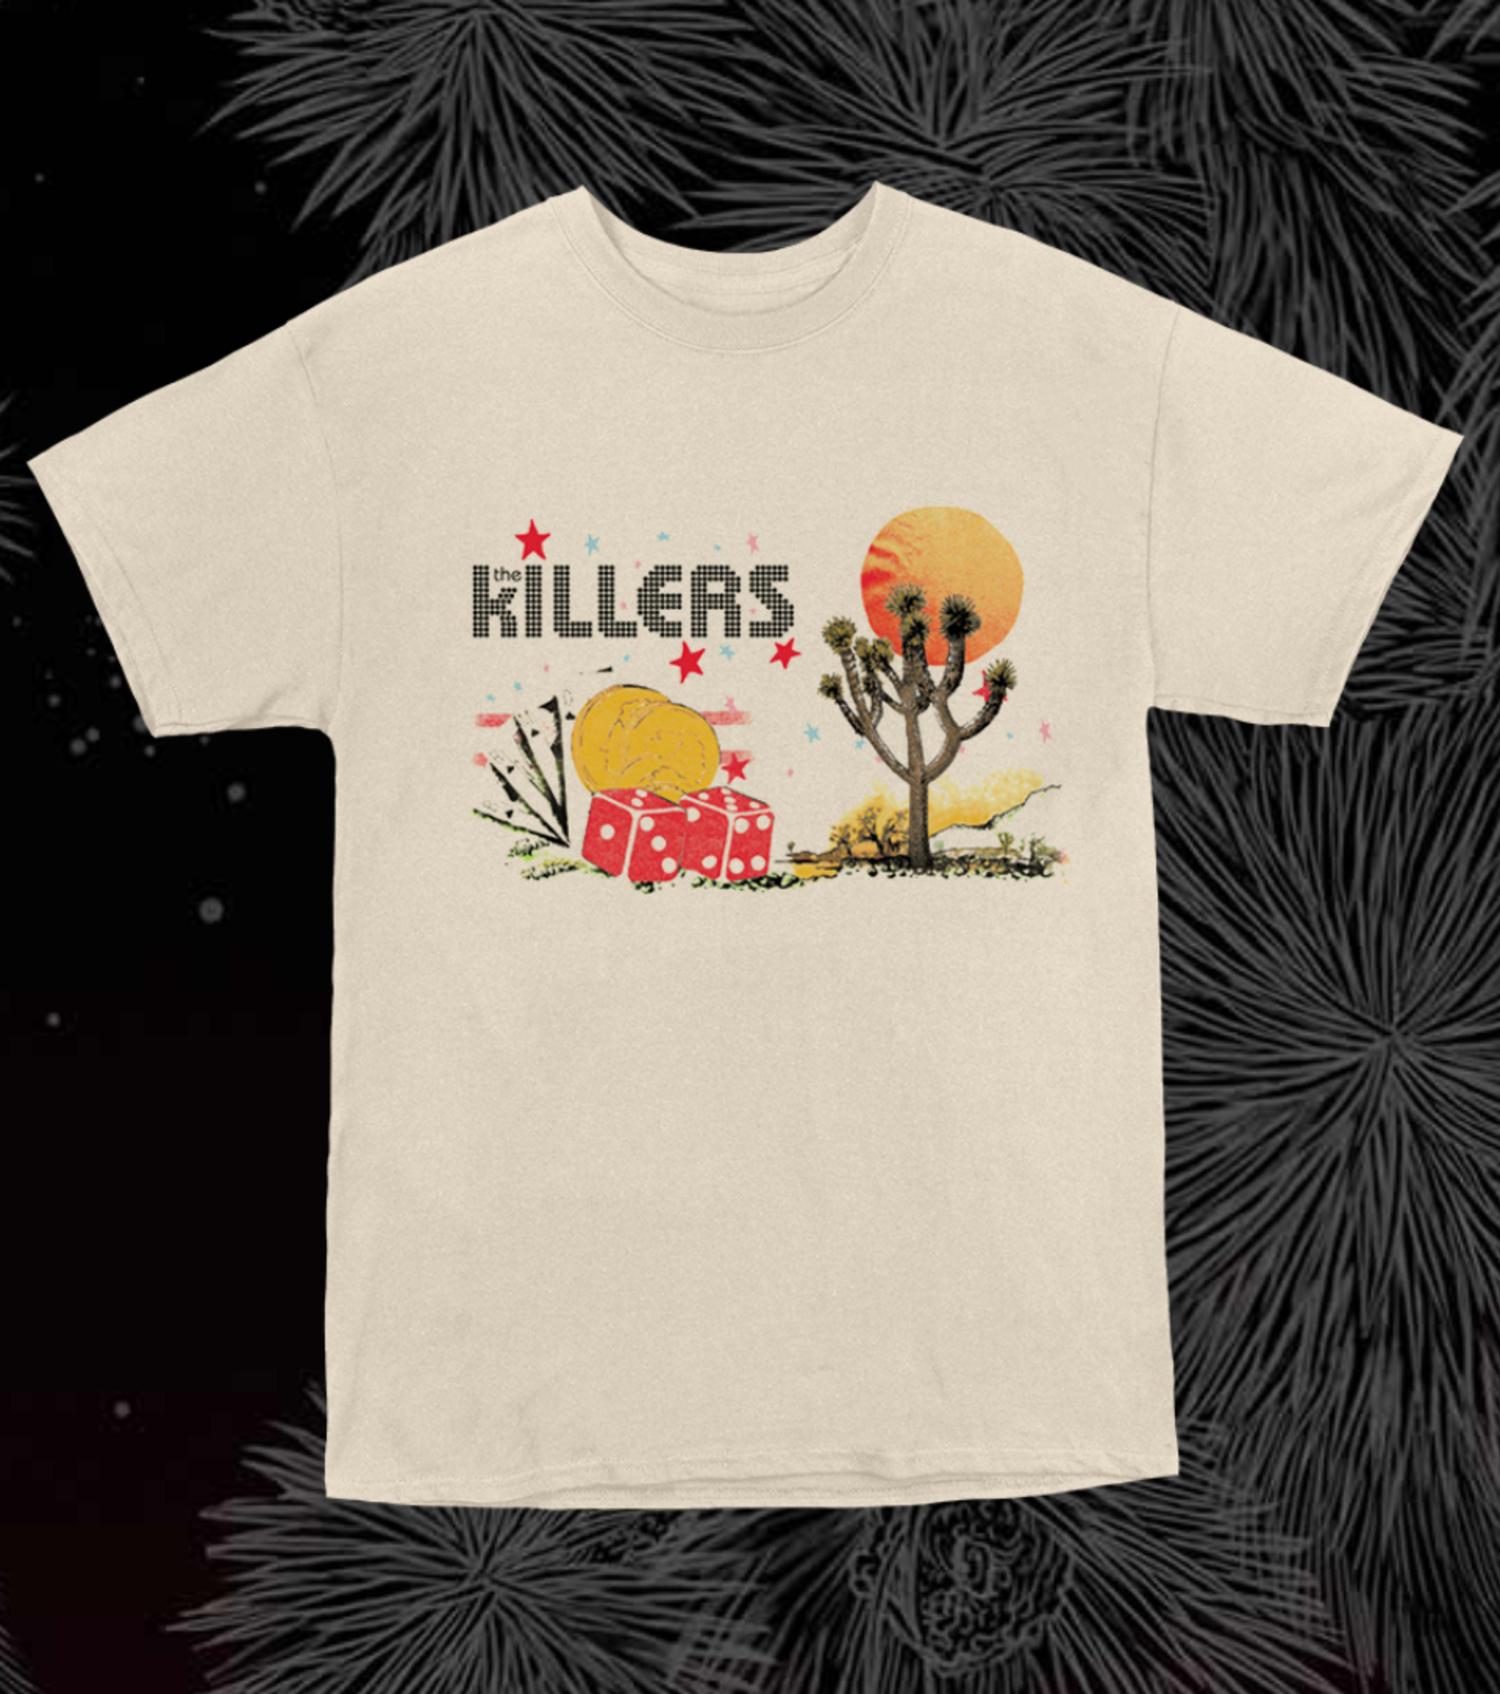 Camiseta The Killers.